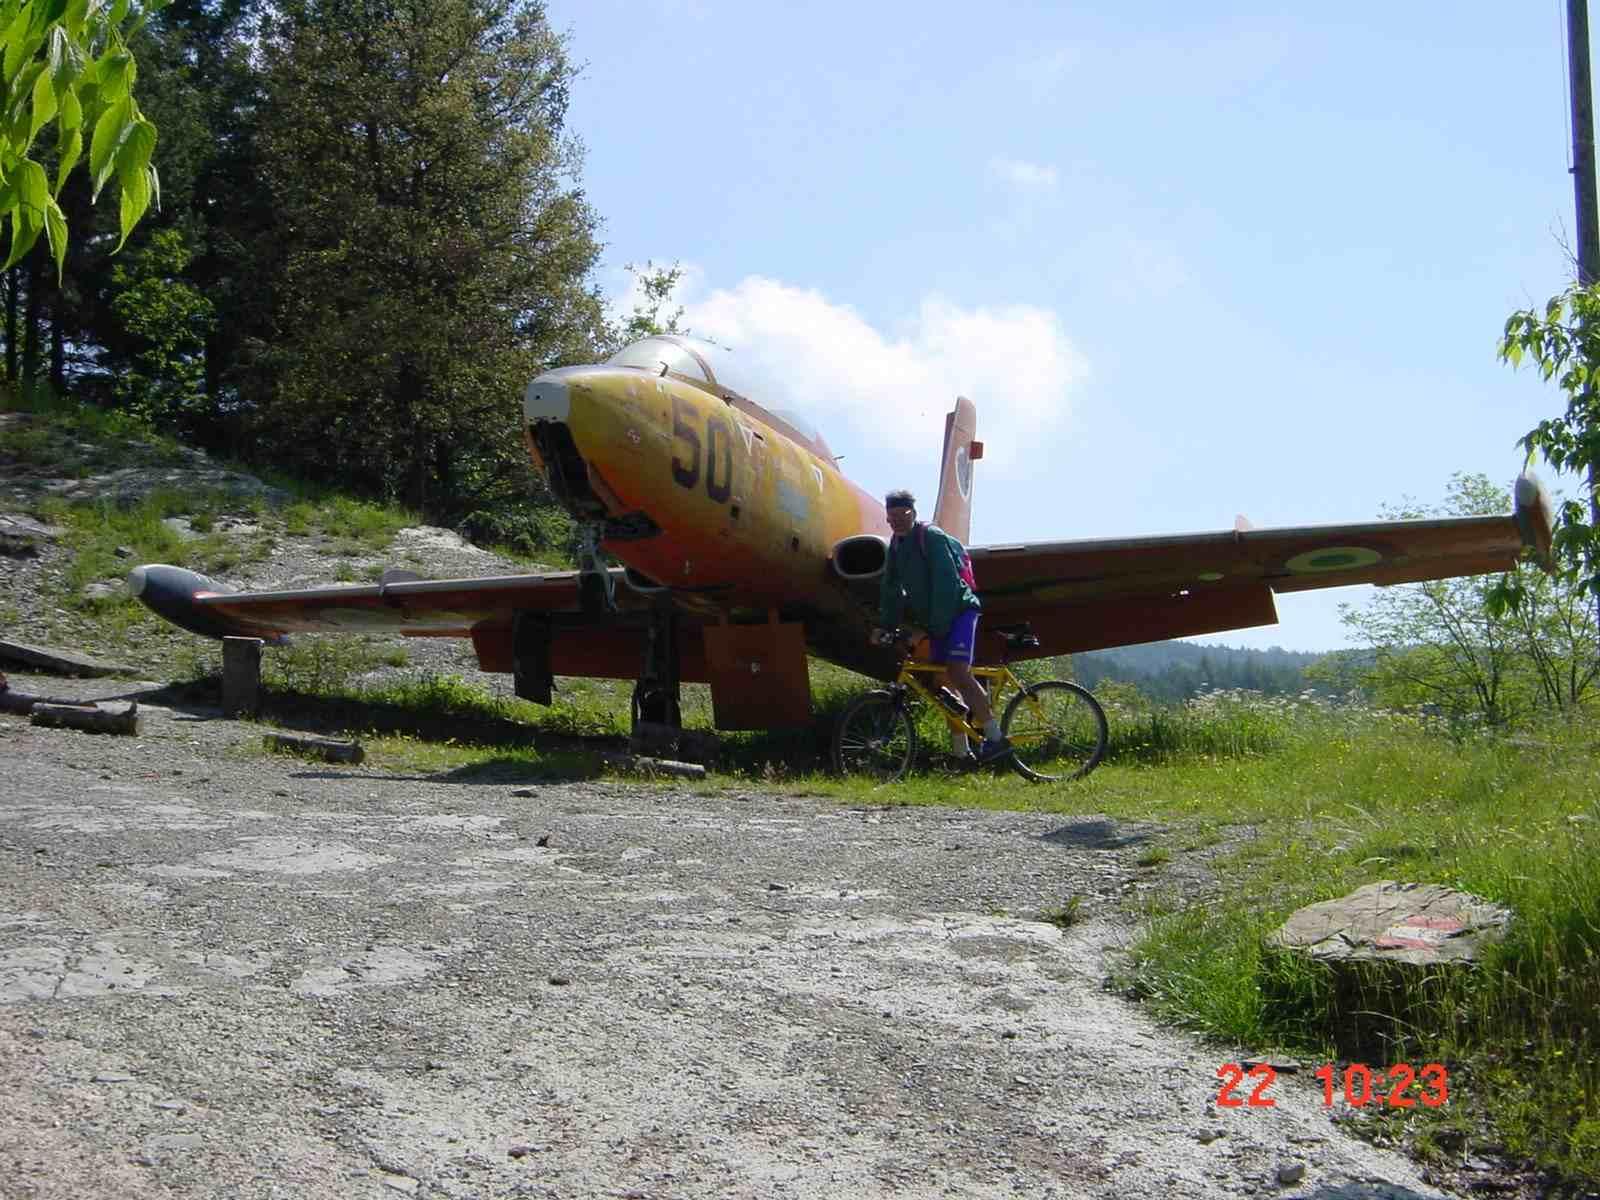 Foto: Manfred Karl / Mountainbike Tour / Monte Castel Giudeo, 1037 m / 20.06.2007 06:28:47